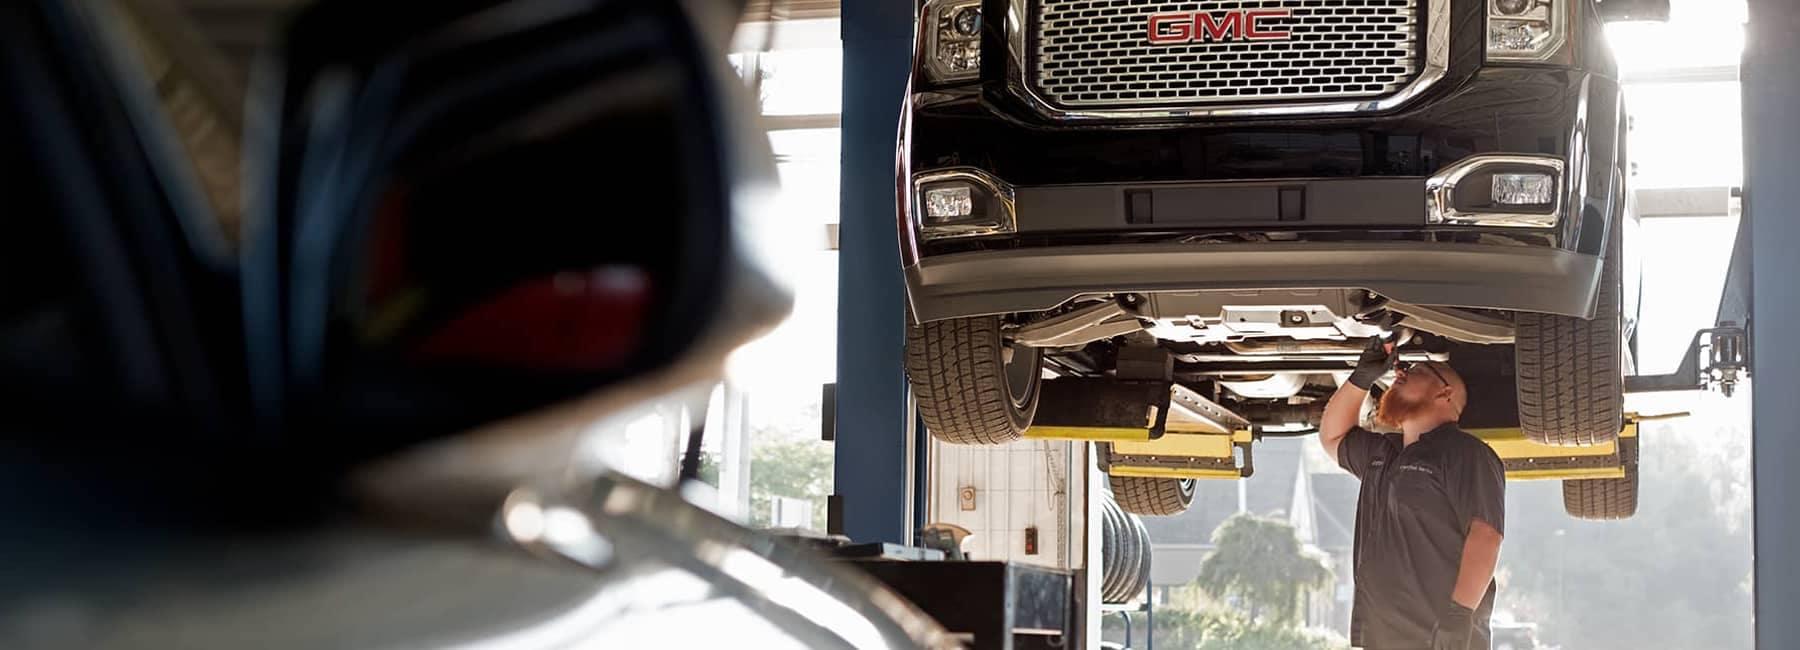 GMC Service Technician looking at underside of GMC vehicle